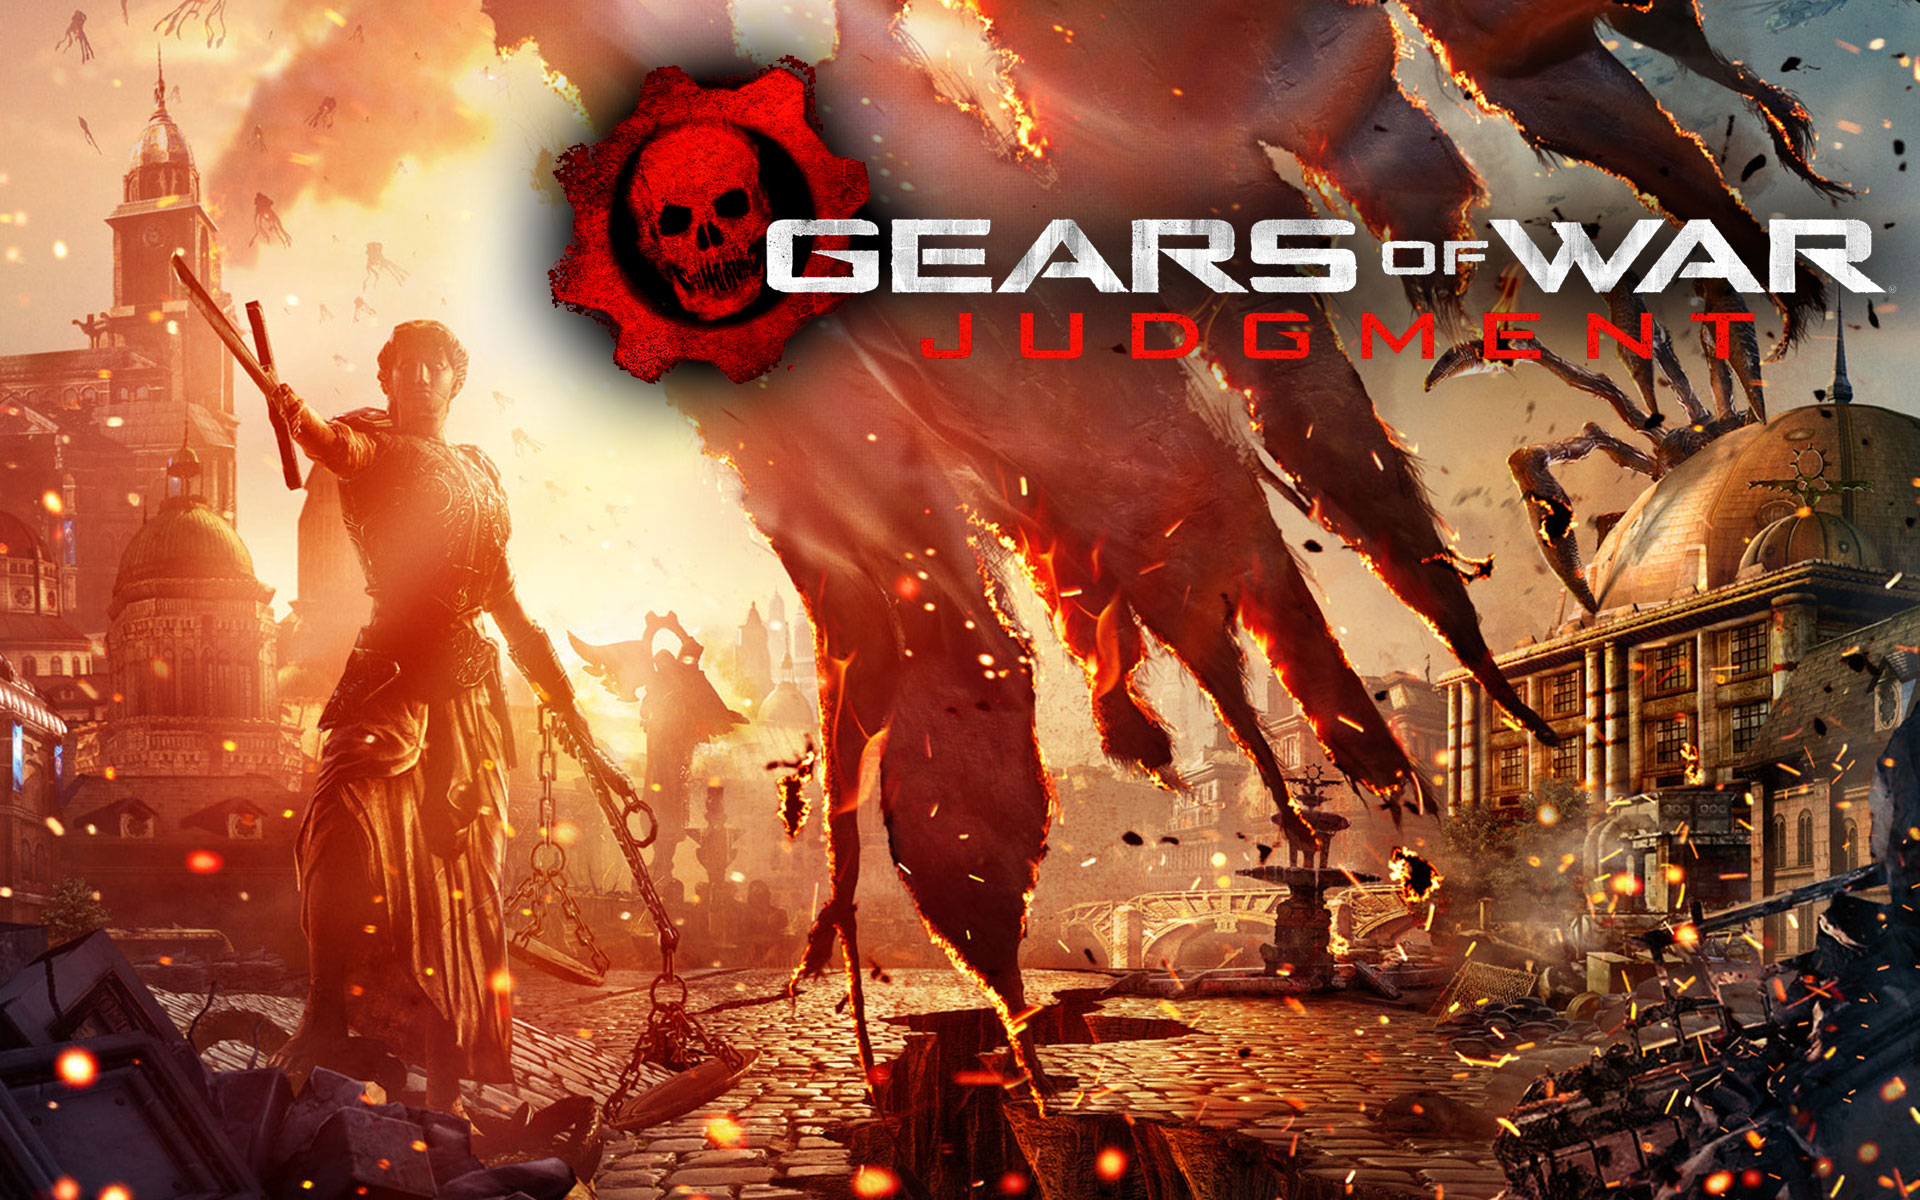 Gears of War Judgment Wallpaper 1920x1200